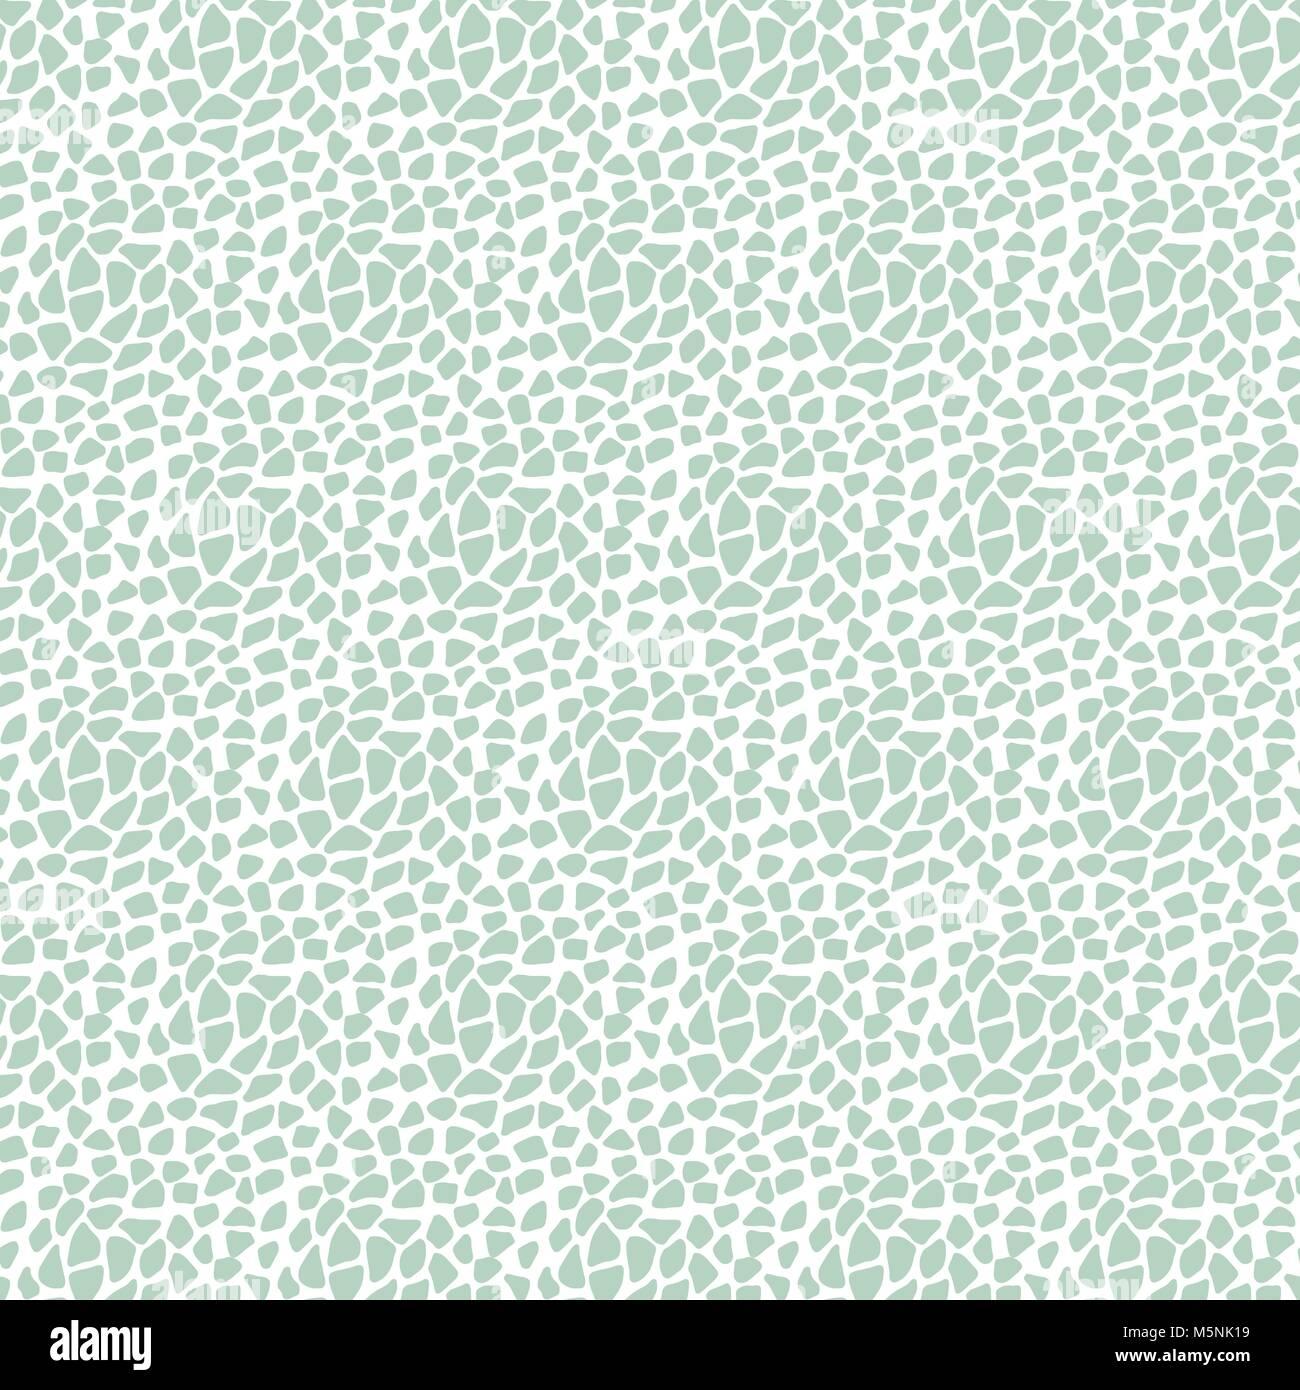 Sweet animal print background, textile, animal decoration, hand drawn illustration - Stock Vector